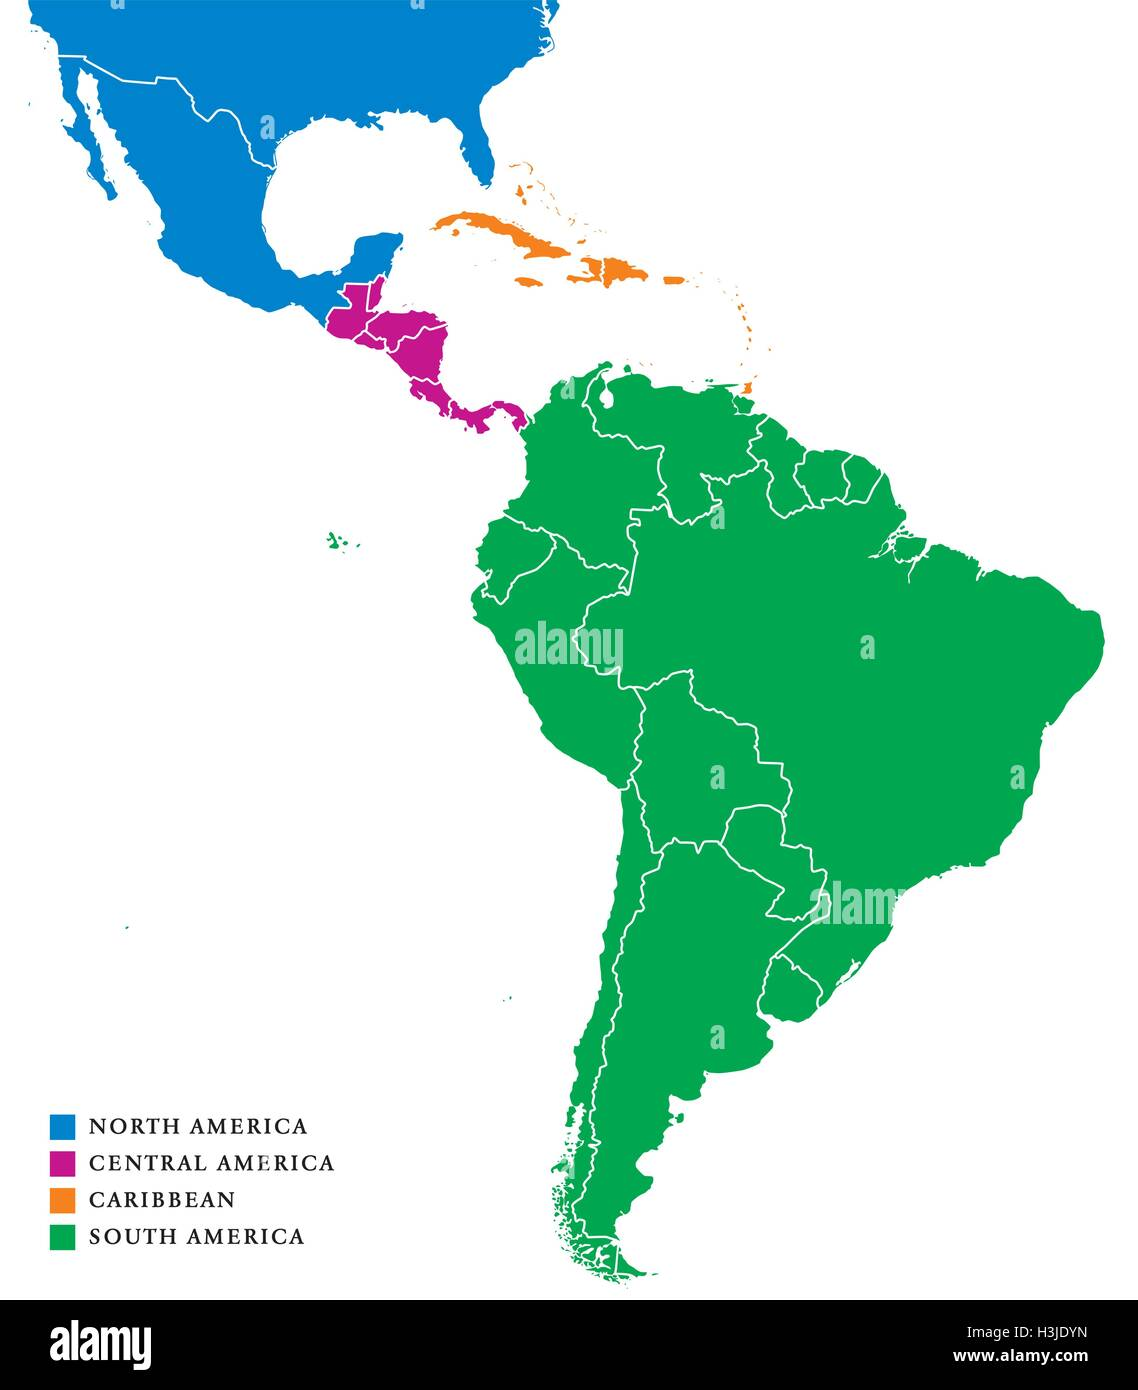 Cartina Politica Dei Caraibi.America Latina Subregioni Della Mappa Le Subregioni Dei Caraibi